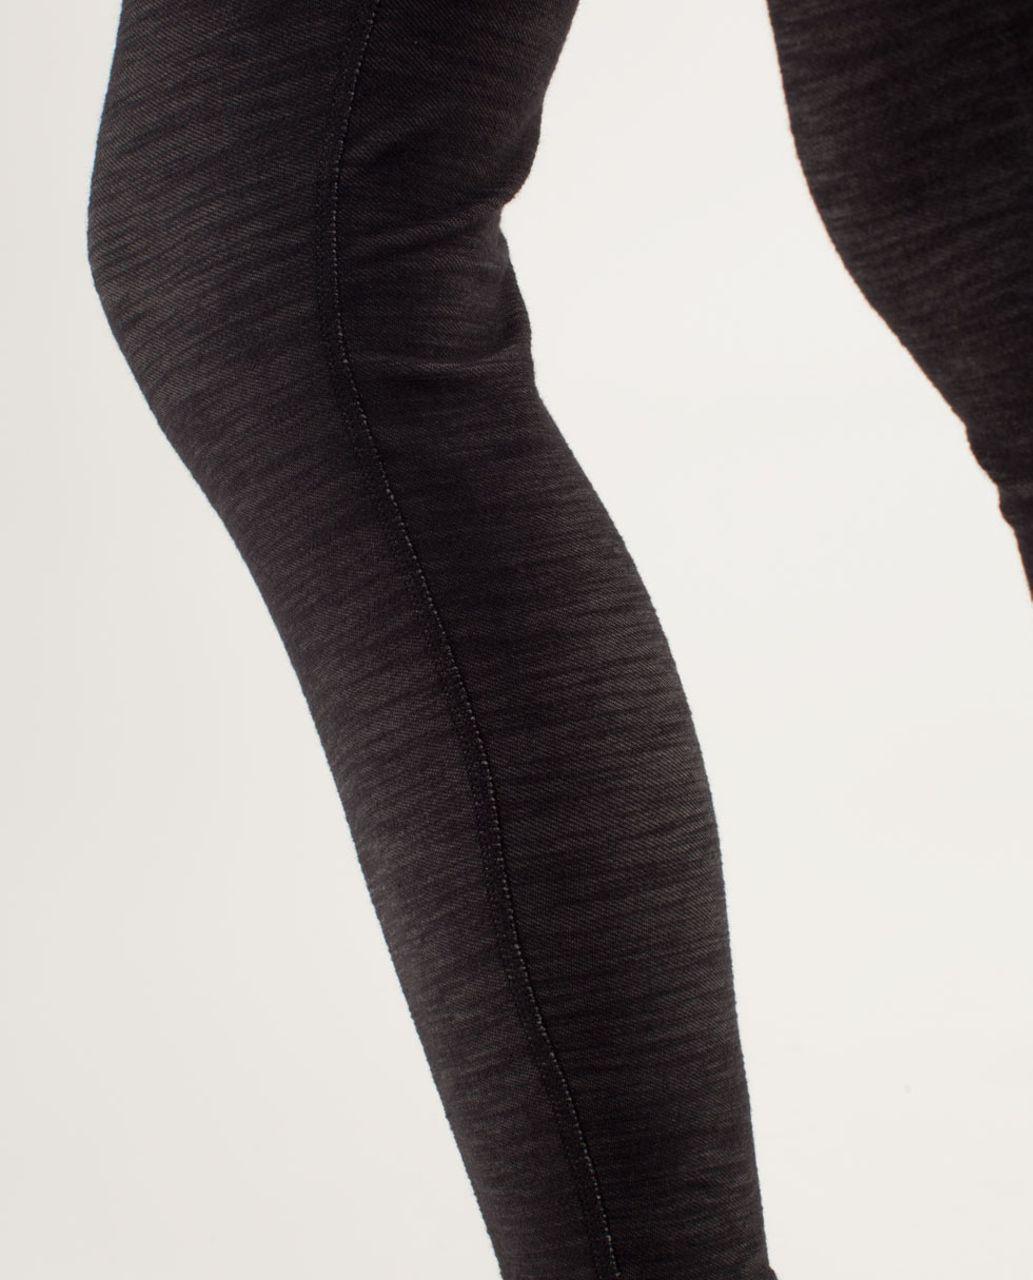 Lululemon Wunder Under Pant *Denim - Black Slub Denim / Lilac